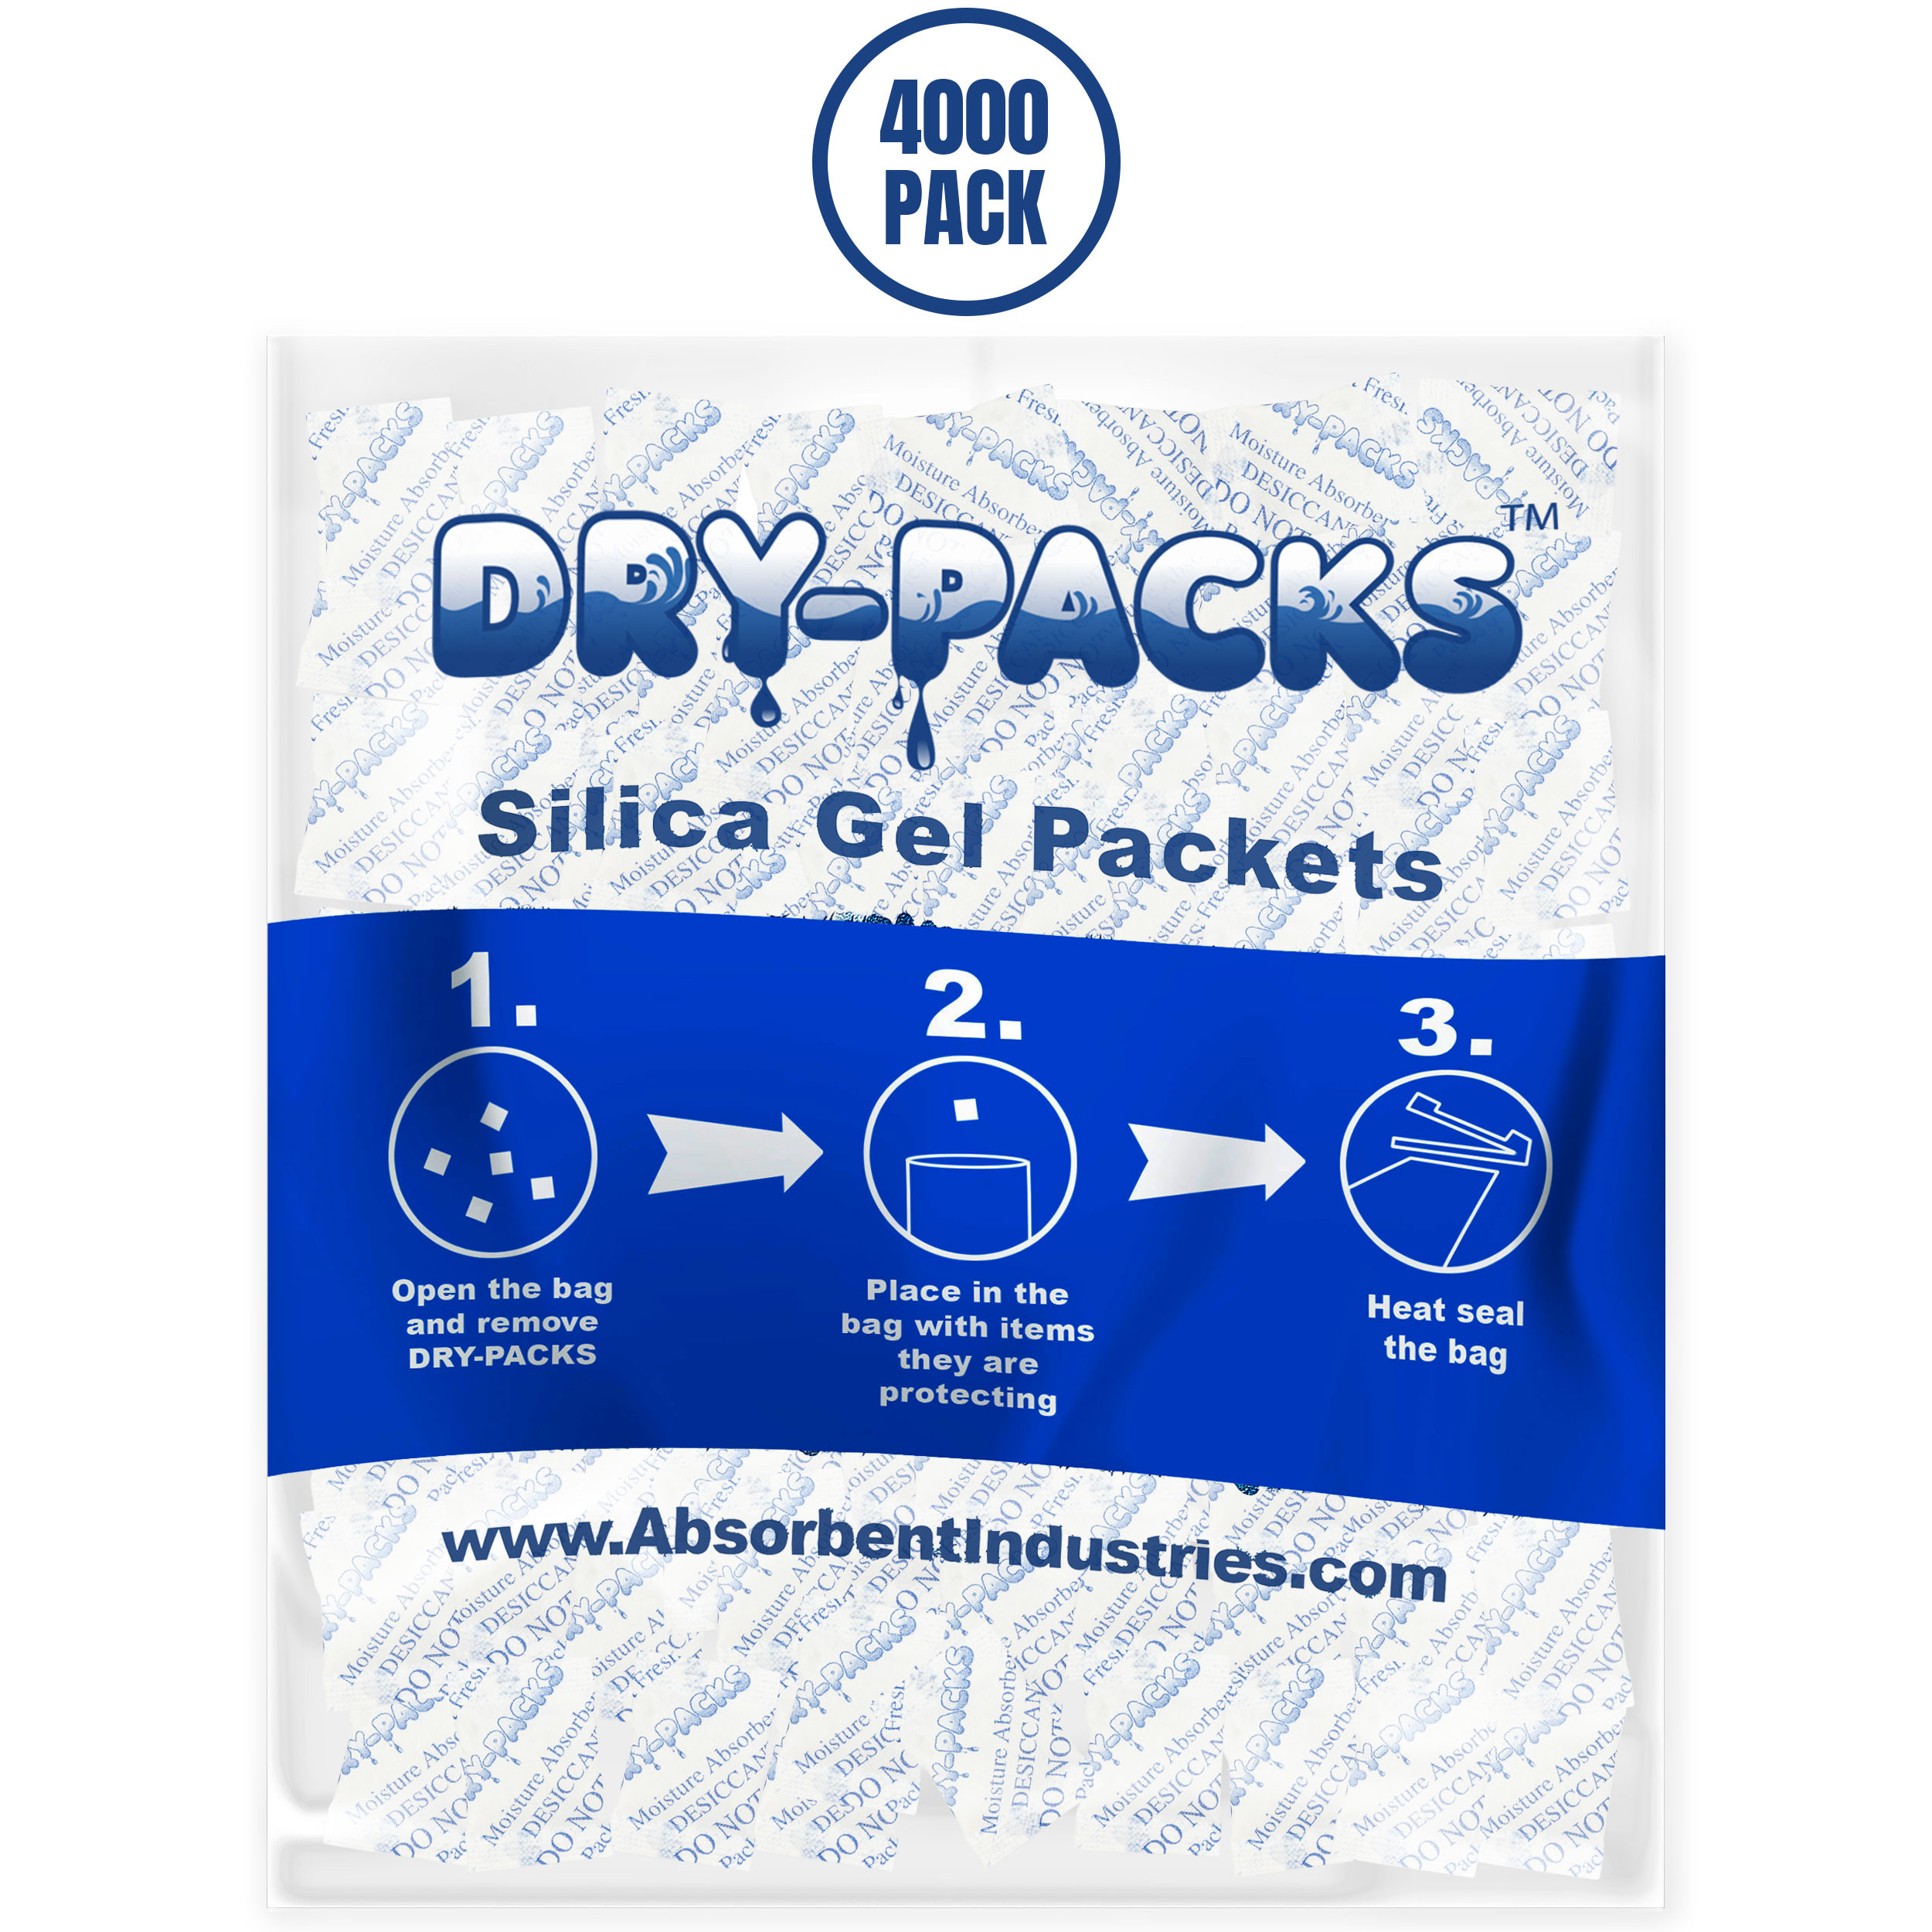 Dry-Packs Industries Silica Gel in Cotton Dehumidifier Absorbs Moisture 1/2 Gram 4000PK, 4000-Pack